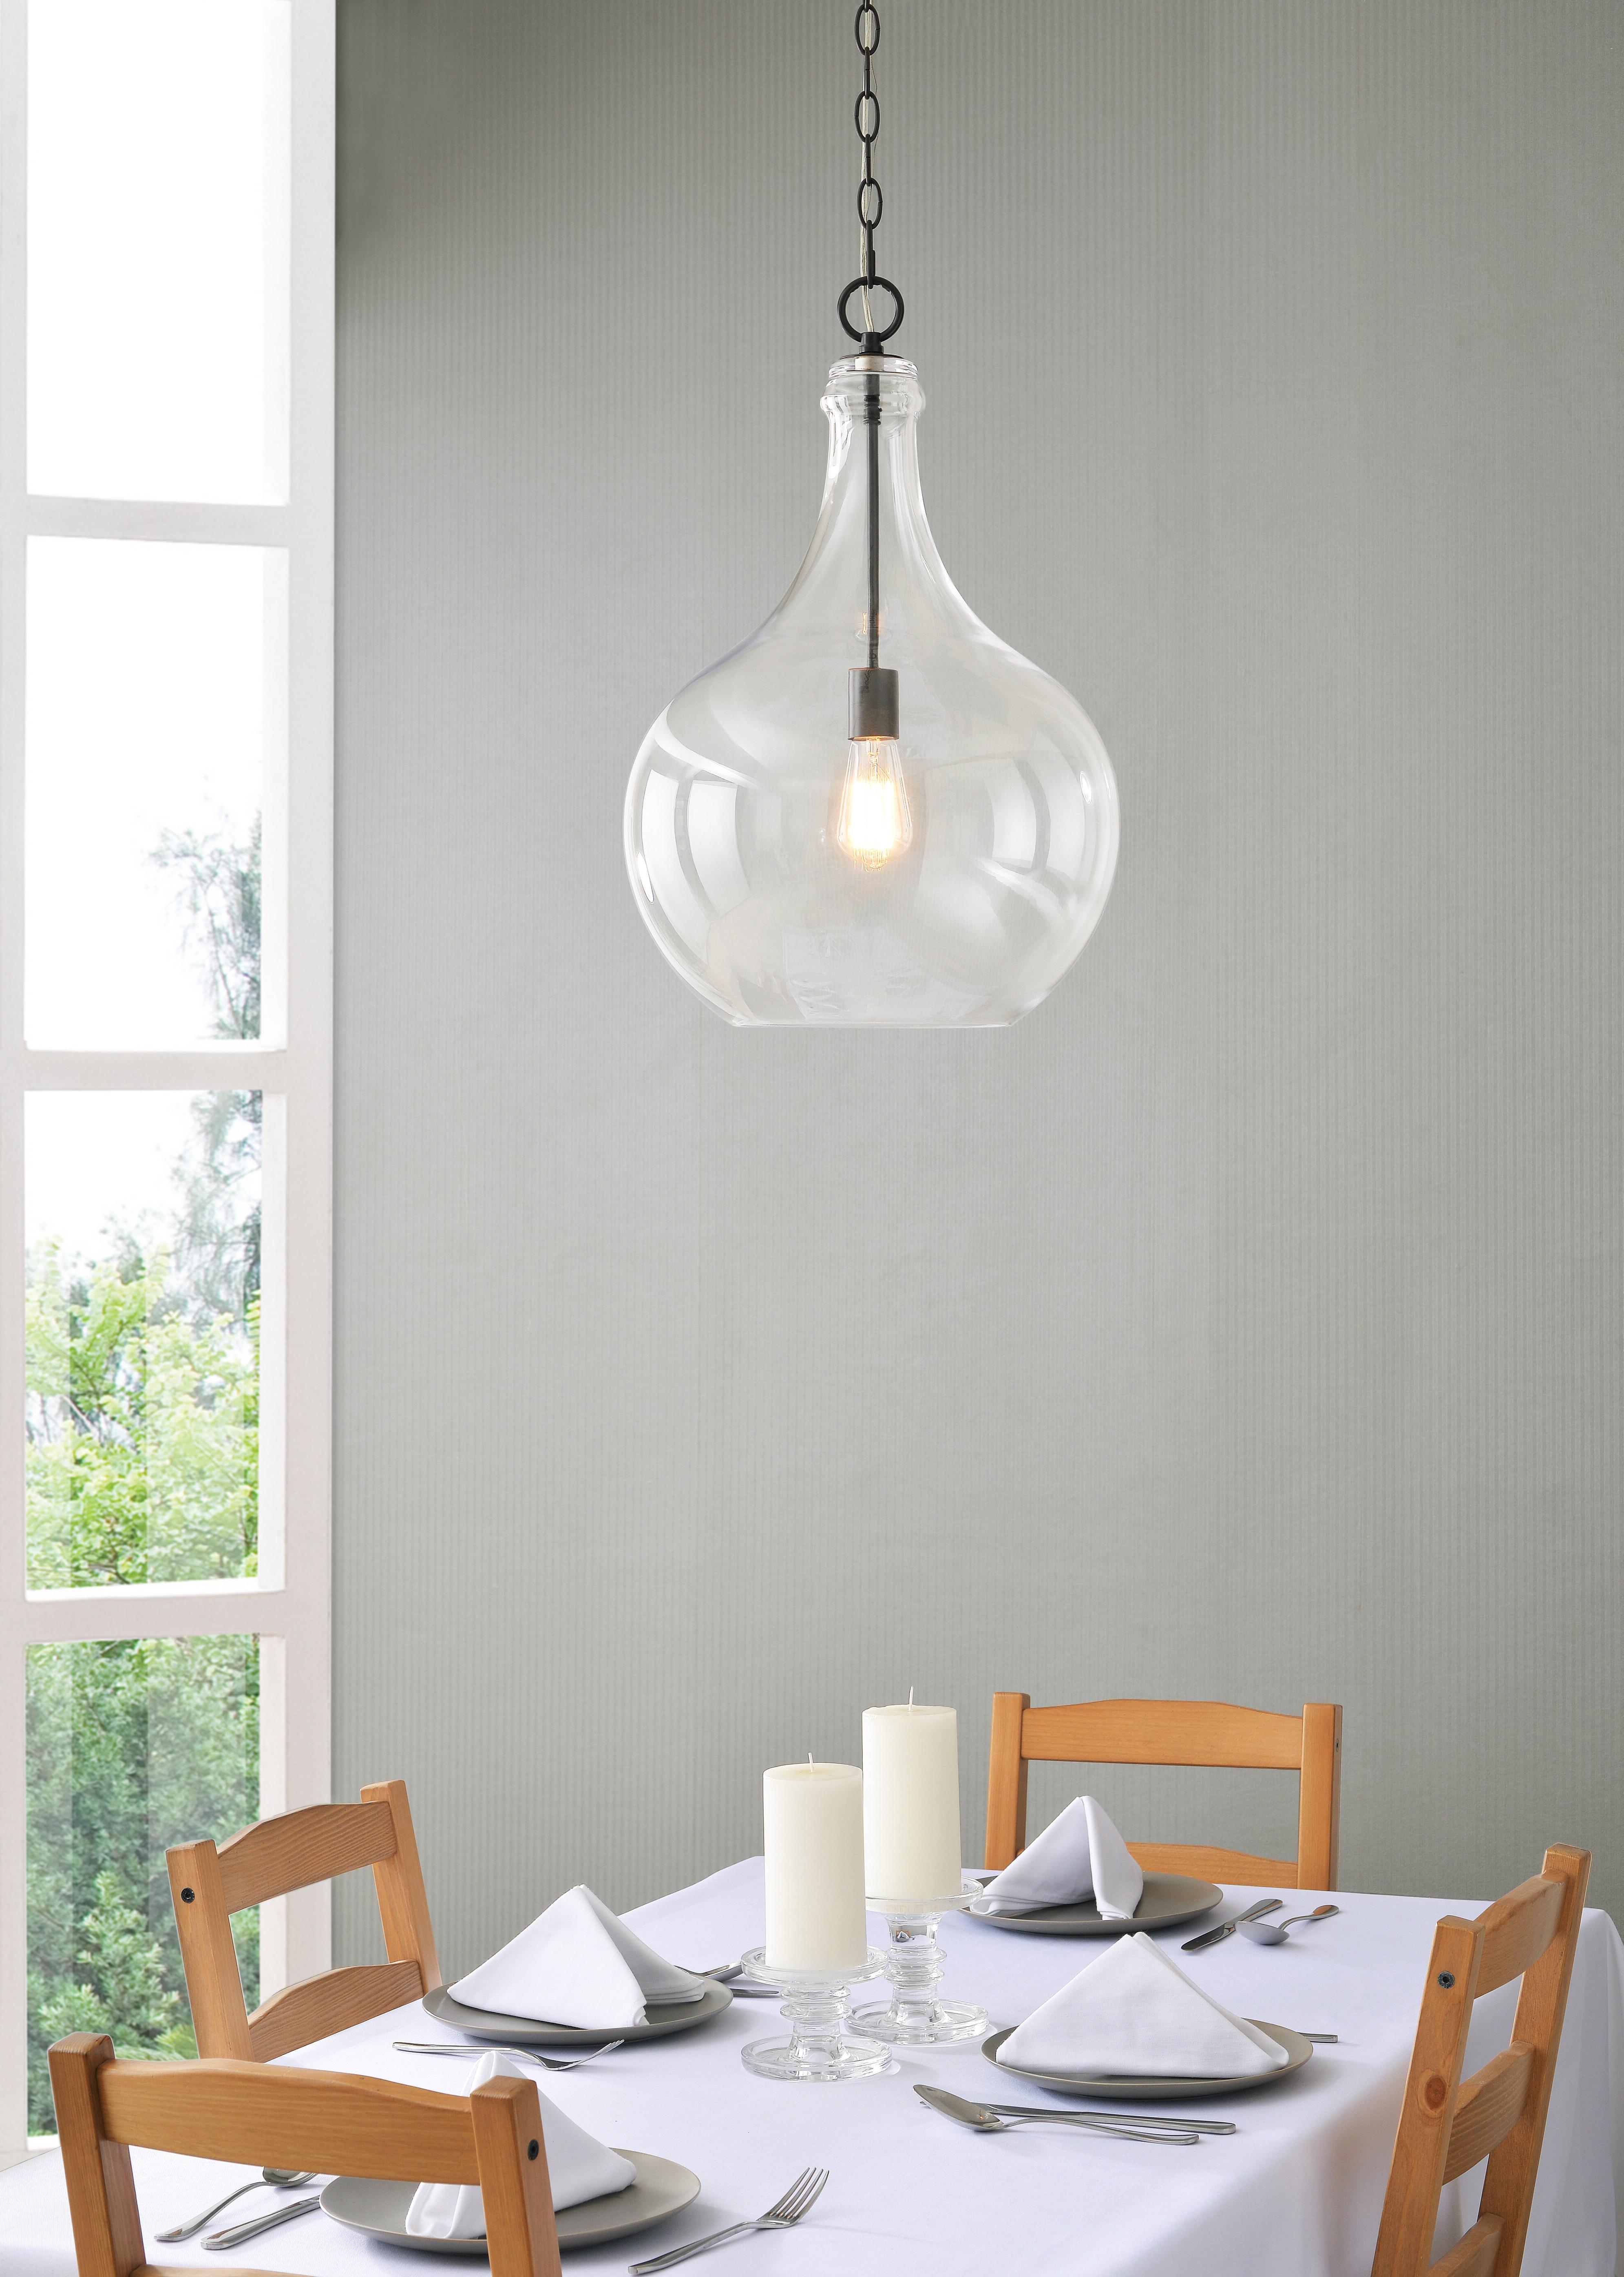 Clematite 1 Light Single Jar Pendants Throughout 2020 Bustillos 1 Light Single Globe Pendant (View 7 of 25)